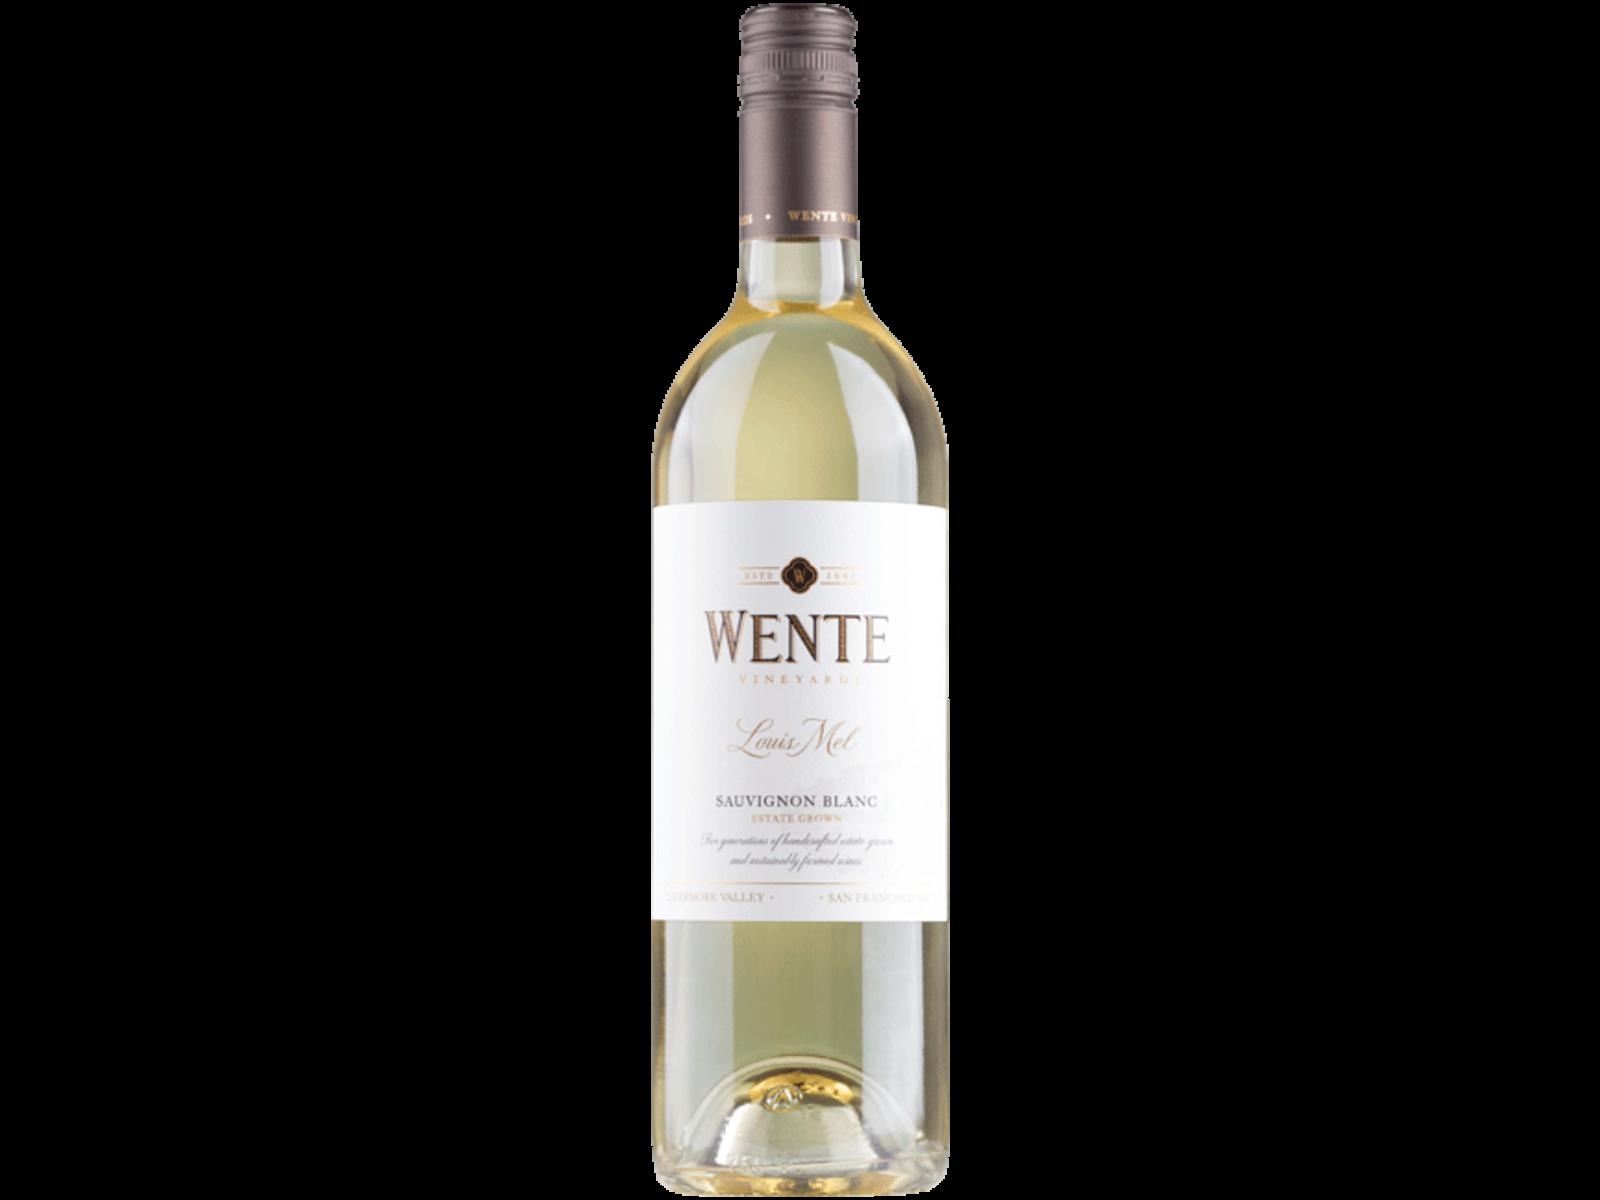 Wente Vineyards Wente / Louis Mel / Sauvignon blanc